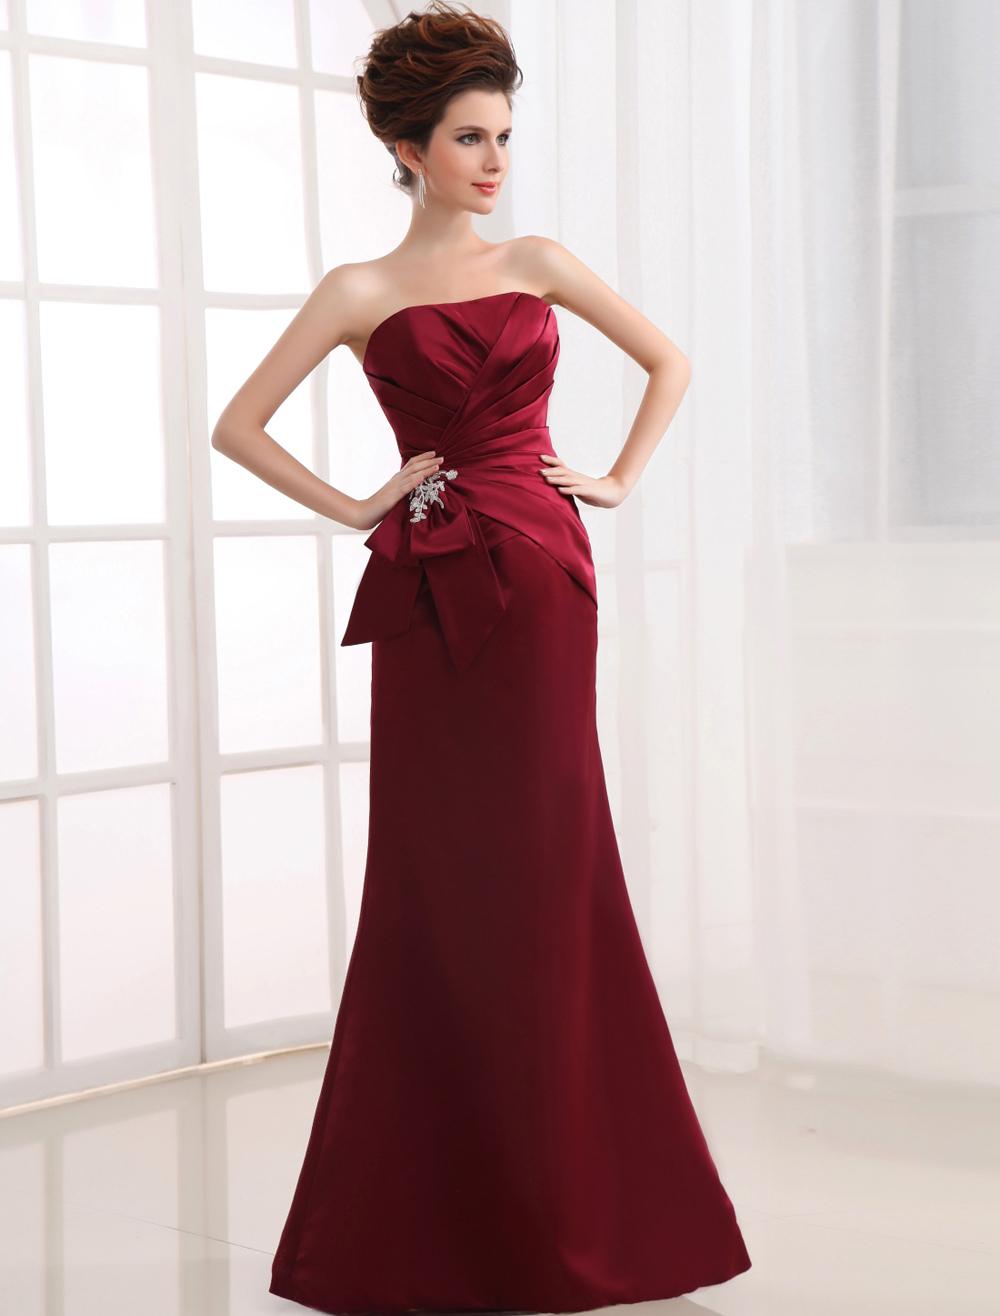 Floor Length Bridesmaid Dress (Wedding Bridesmaid Dresses) photo